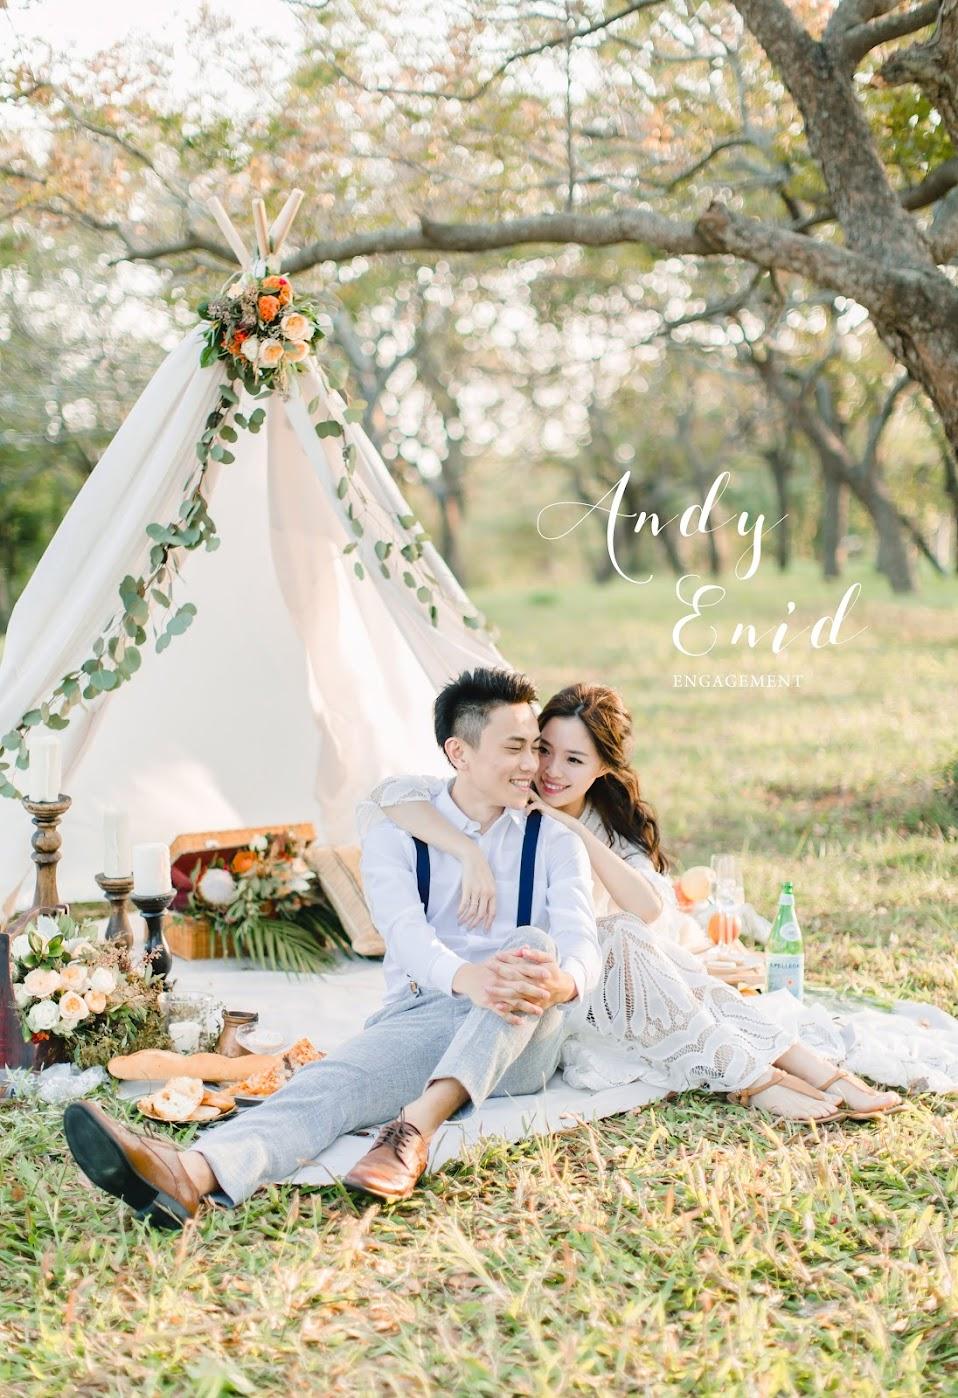 Amazing grace Studio,自助婚紗,美式婚紗,台中婚紗,engagement,fine art,wedding photography